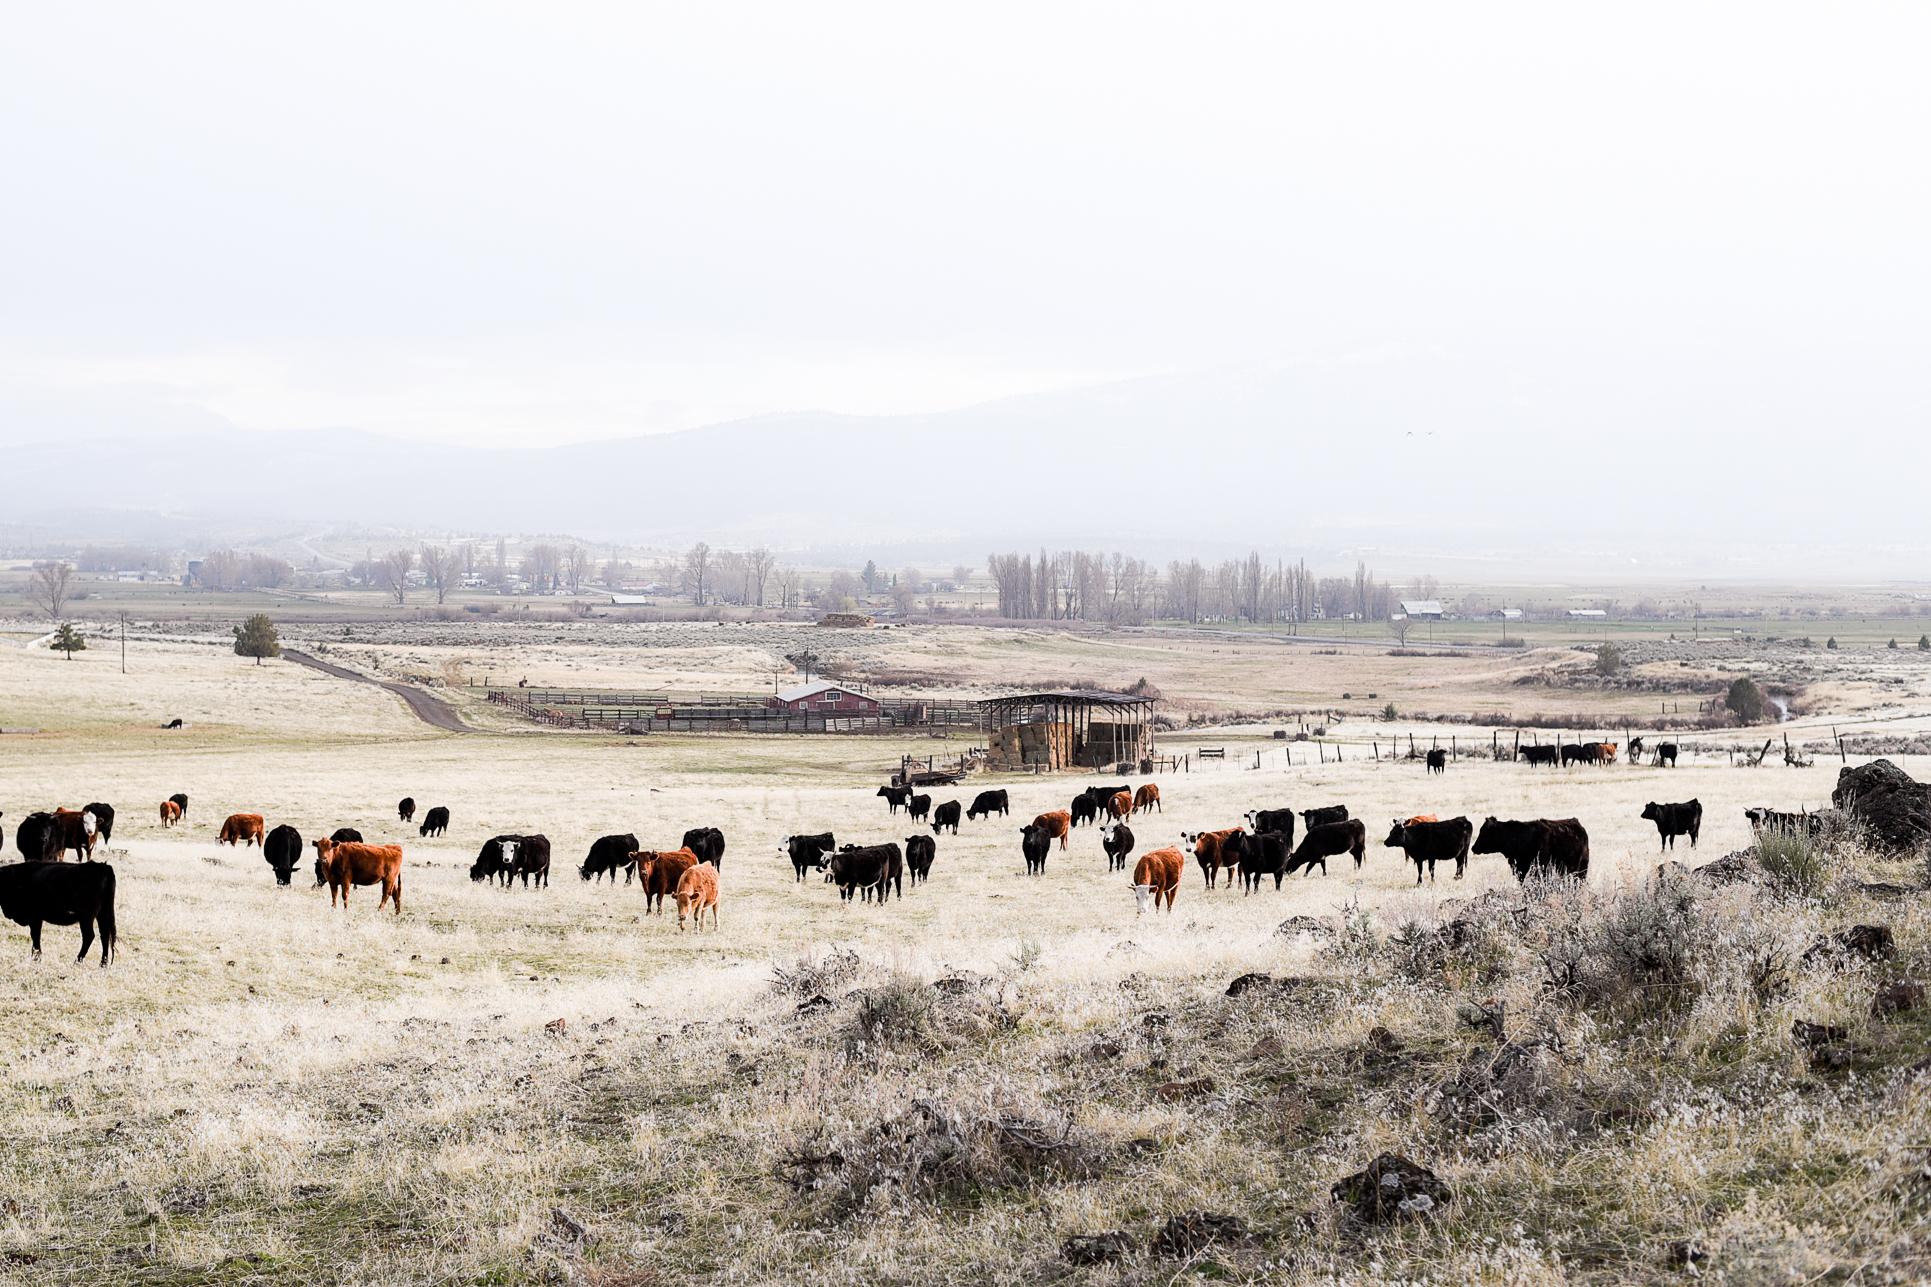 Calving Season on the Ranch | boxwoodavenue.com